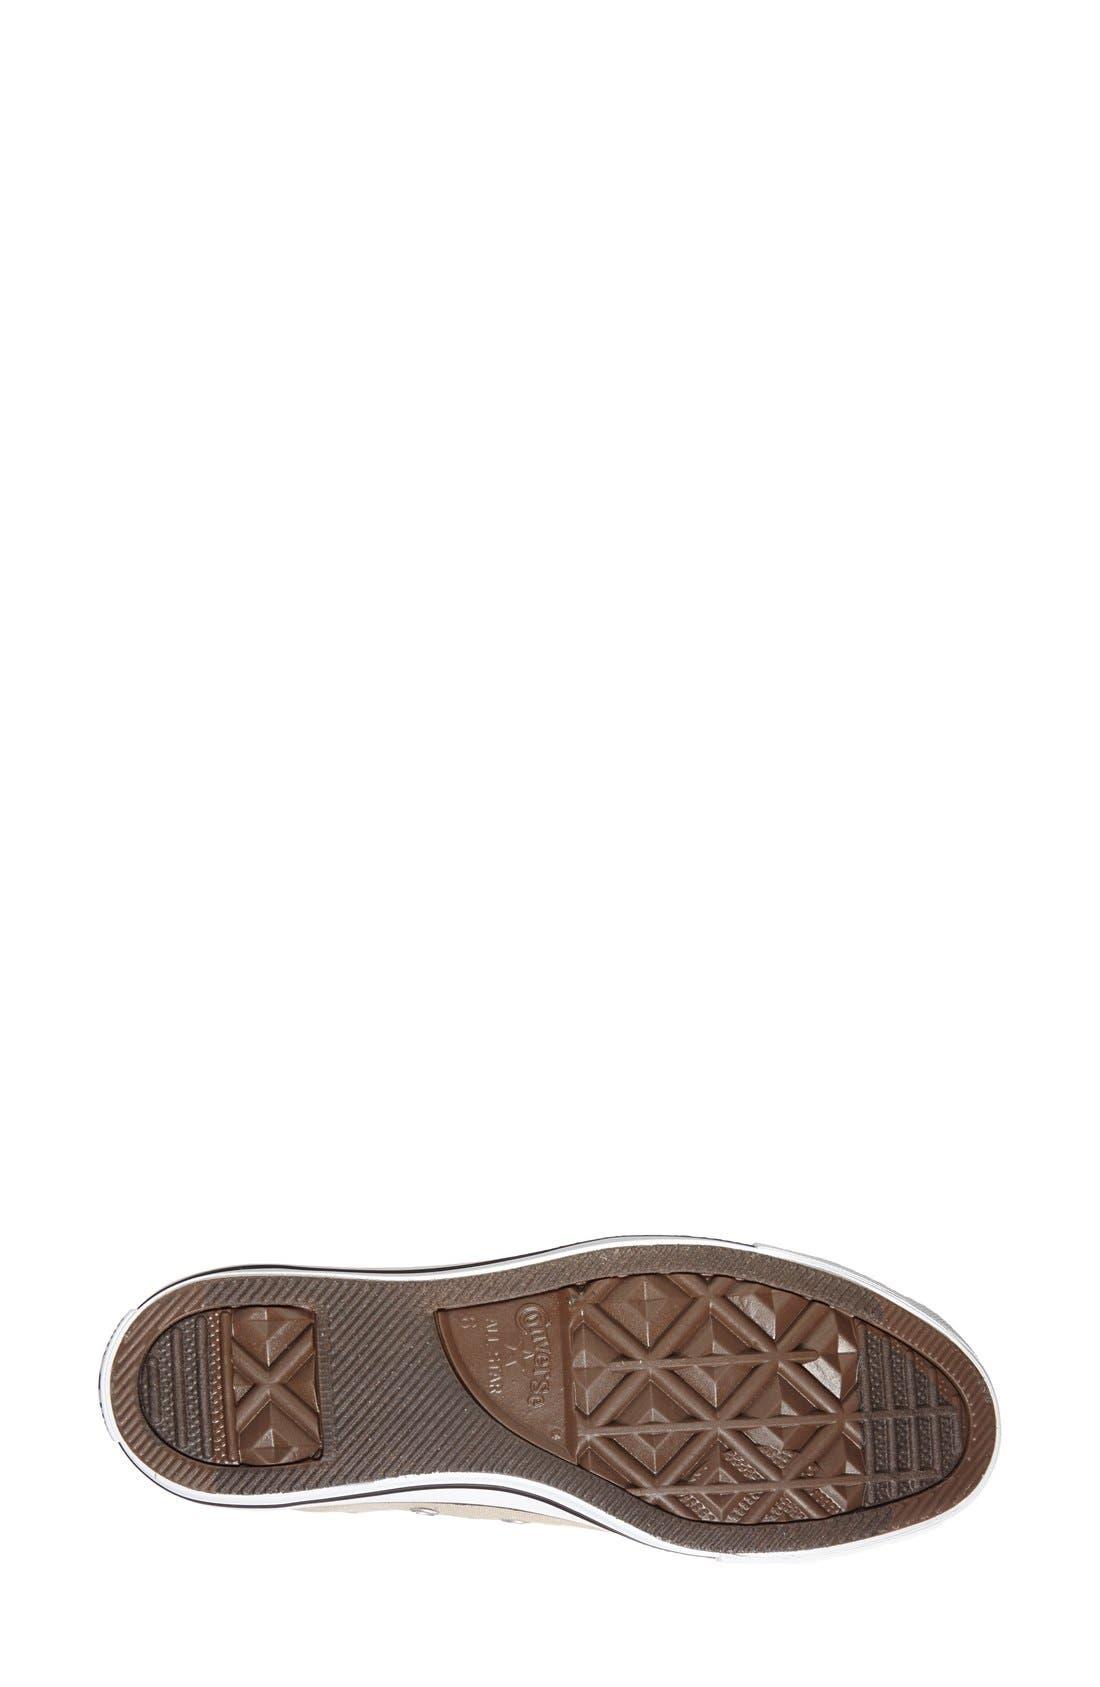 Alternate Image 4  - Converse Chuck Taylor® All Star®' Seasonal' High Top Sneaker (Women)